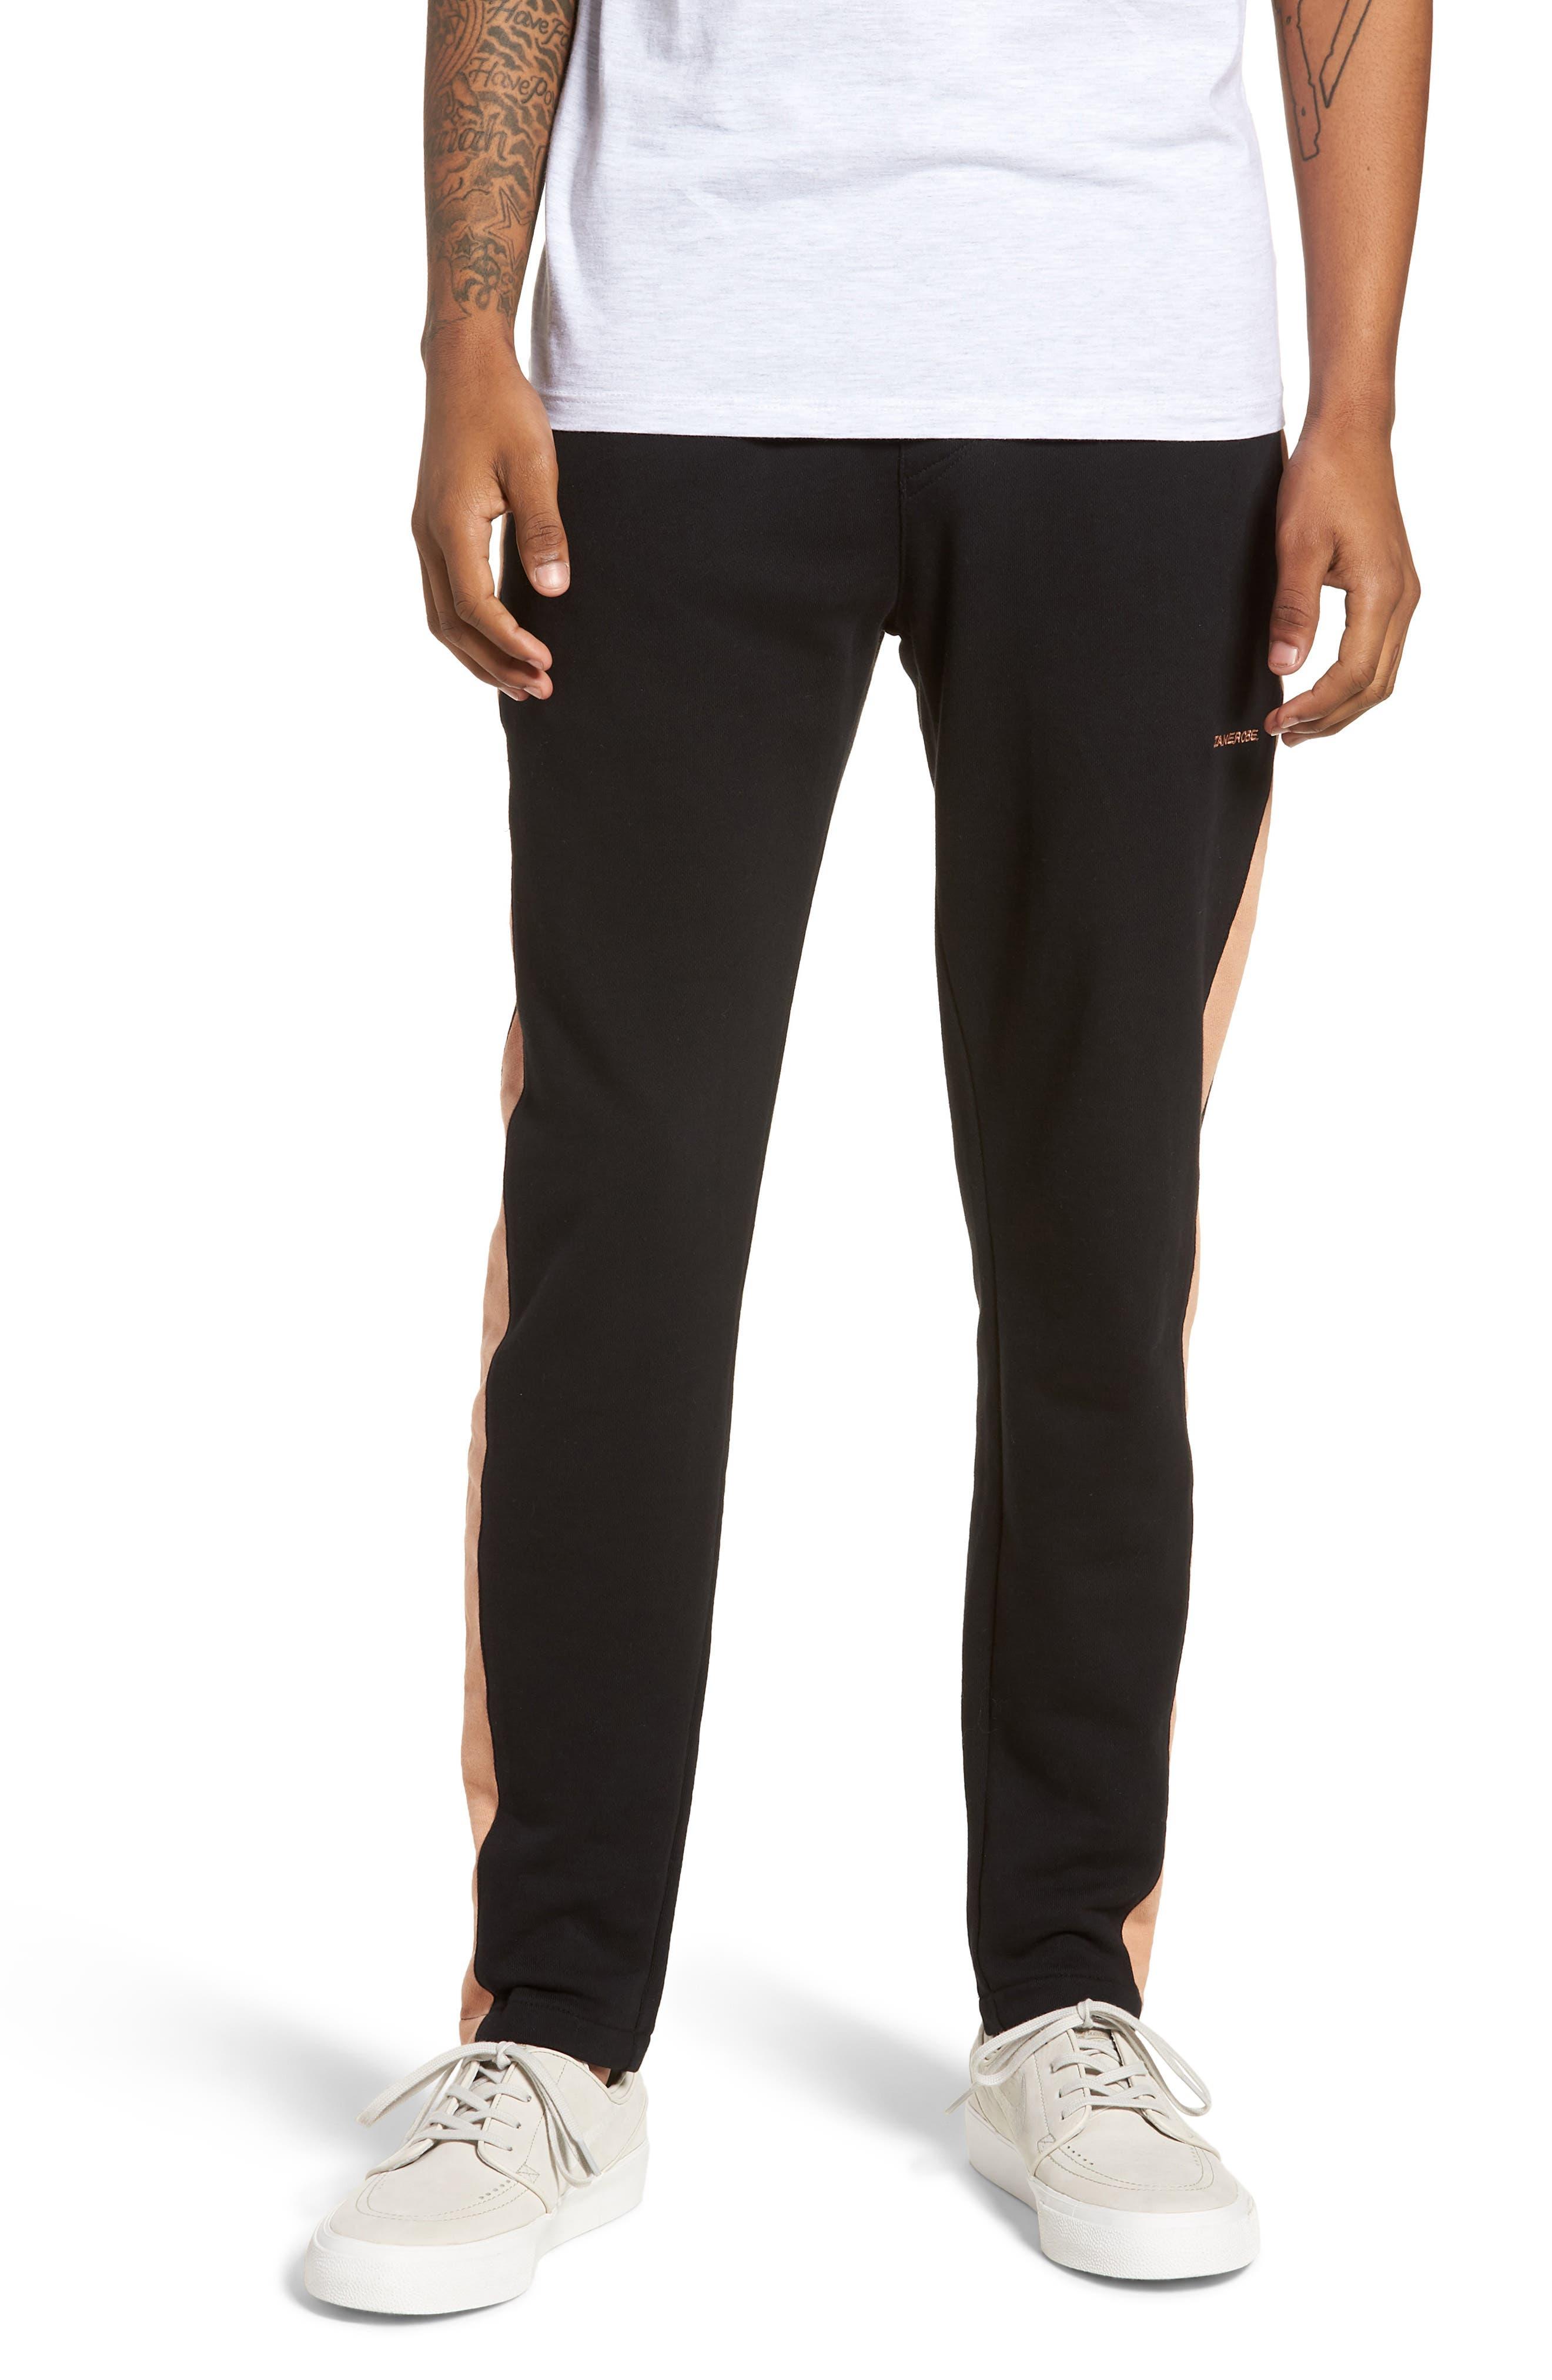 Jumpshot Slim Track Pants,                         Main,                         color, BLACK/ BISCUIT